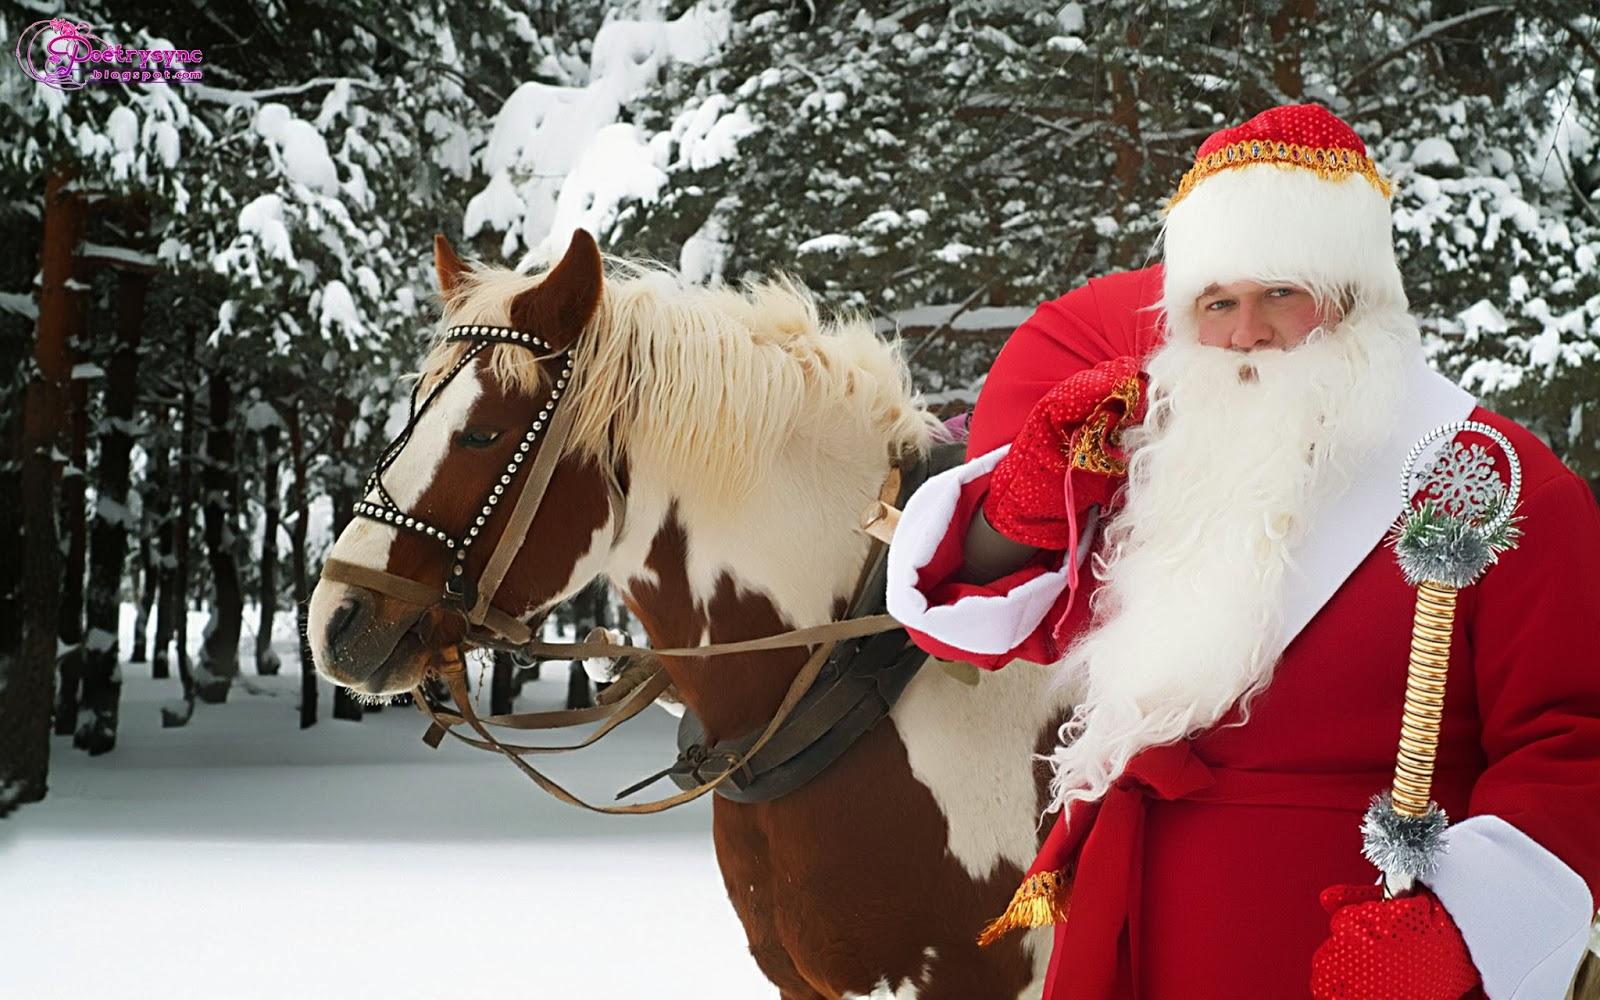 Christmas-Santa-Merry-Christmas-Santa-Claus-in-Snow-with-Horse-wallpaper-wp4604758